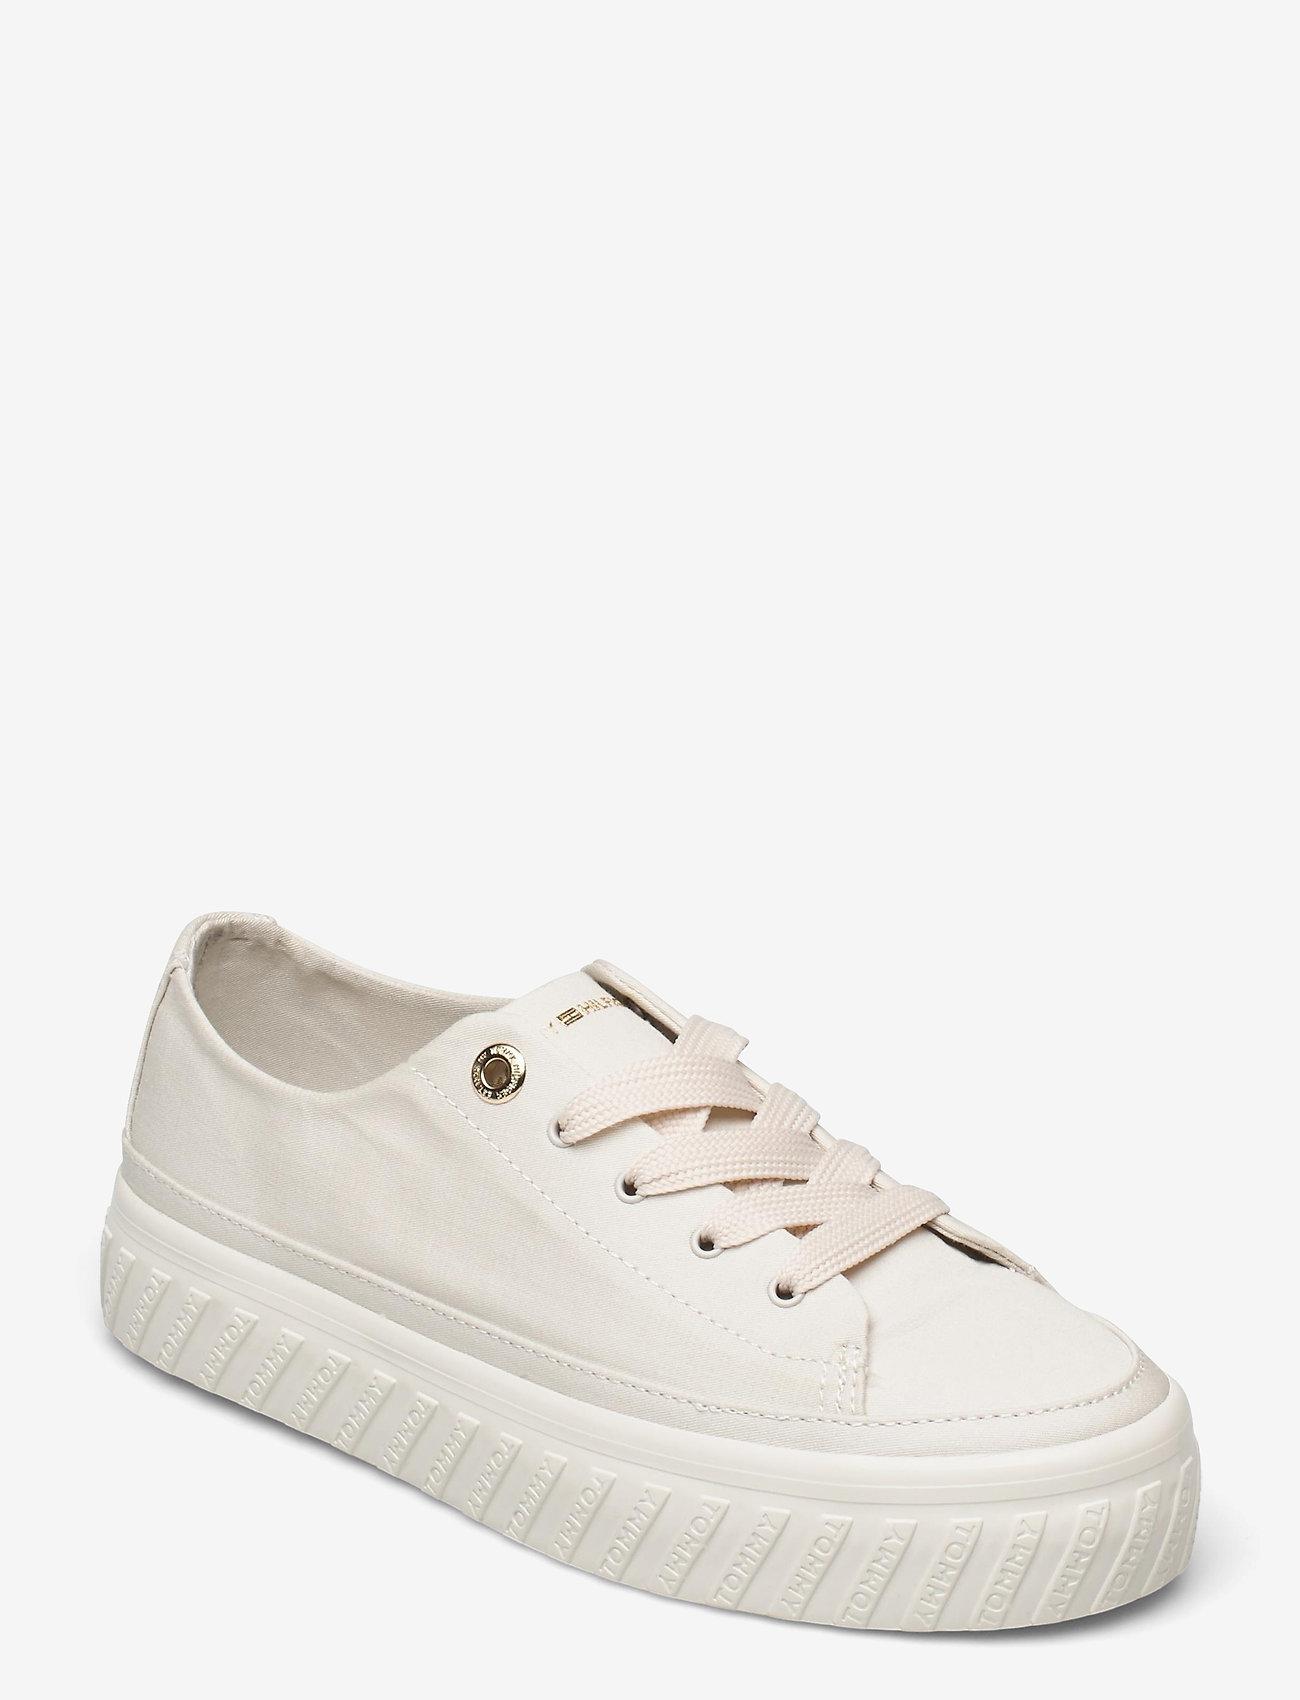 Tommy Hilfiger - SHINY FLATFORM VULC SNEAKER - sneakers - white dove - 0